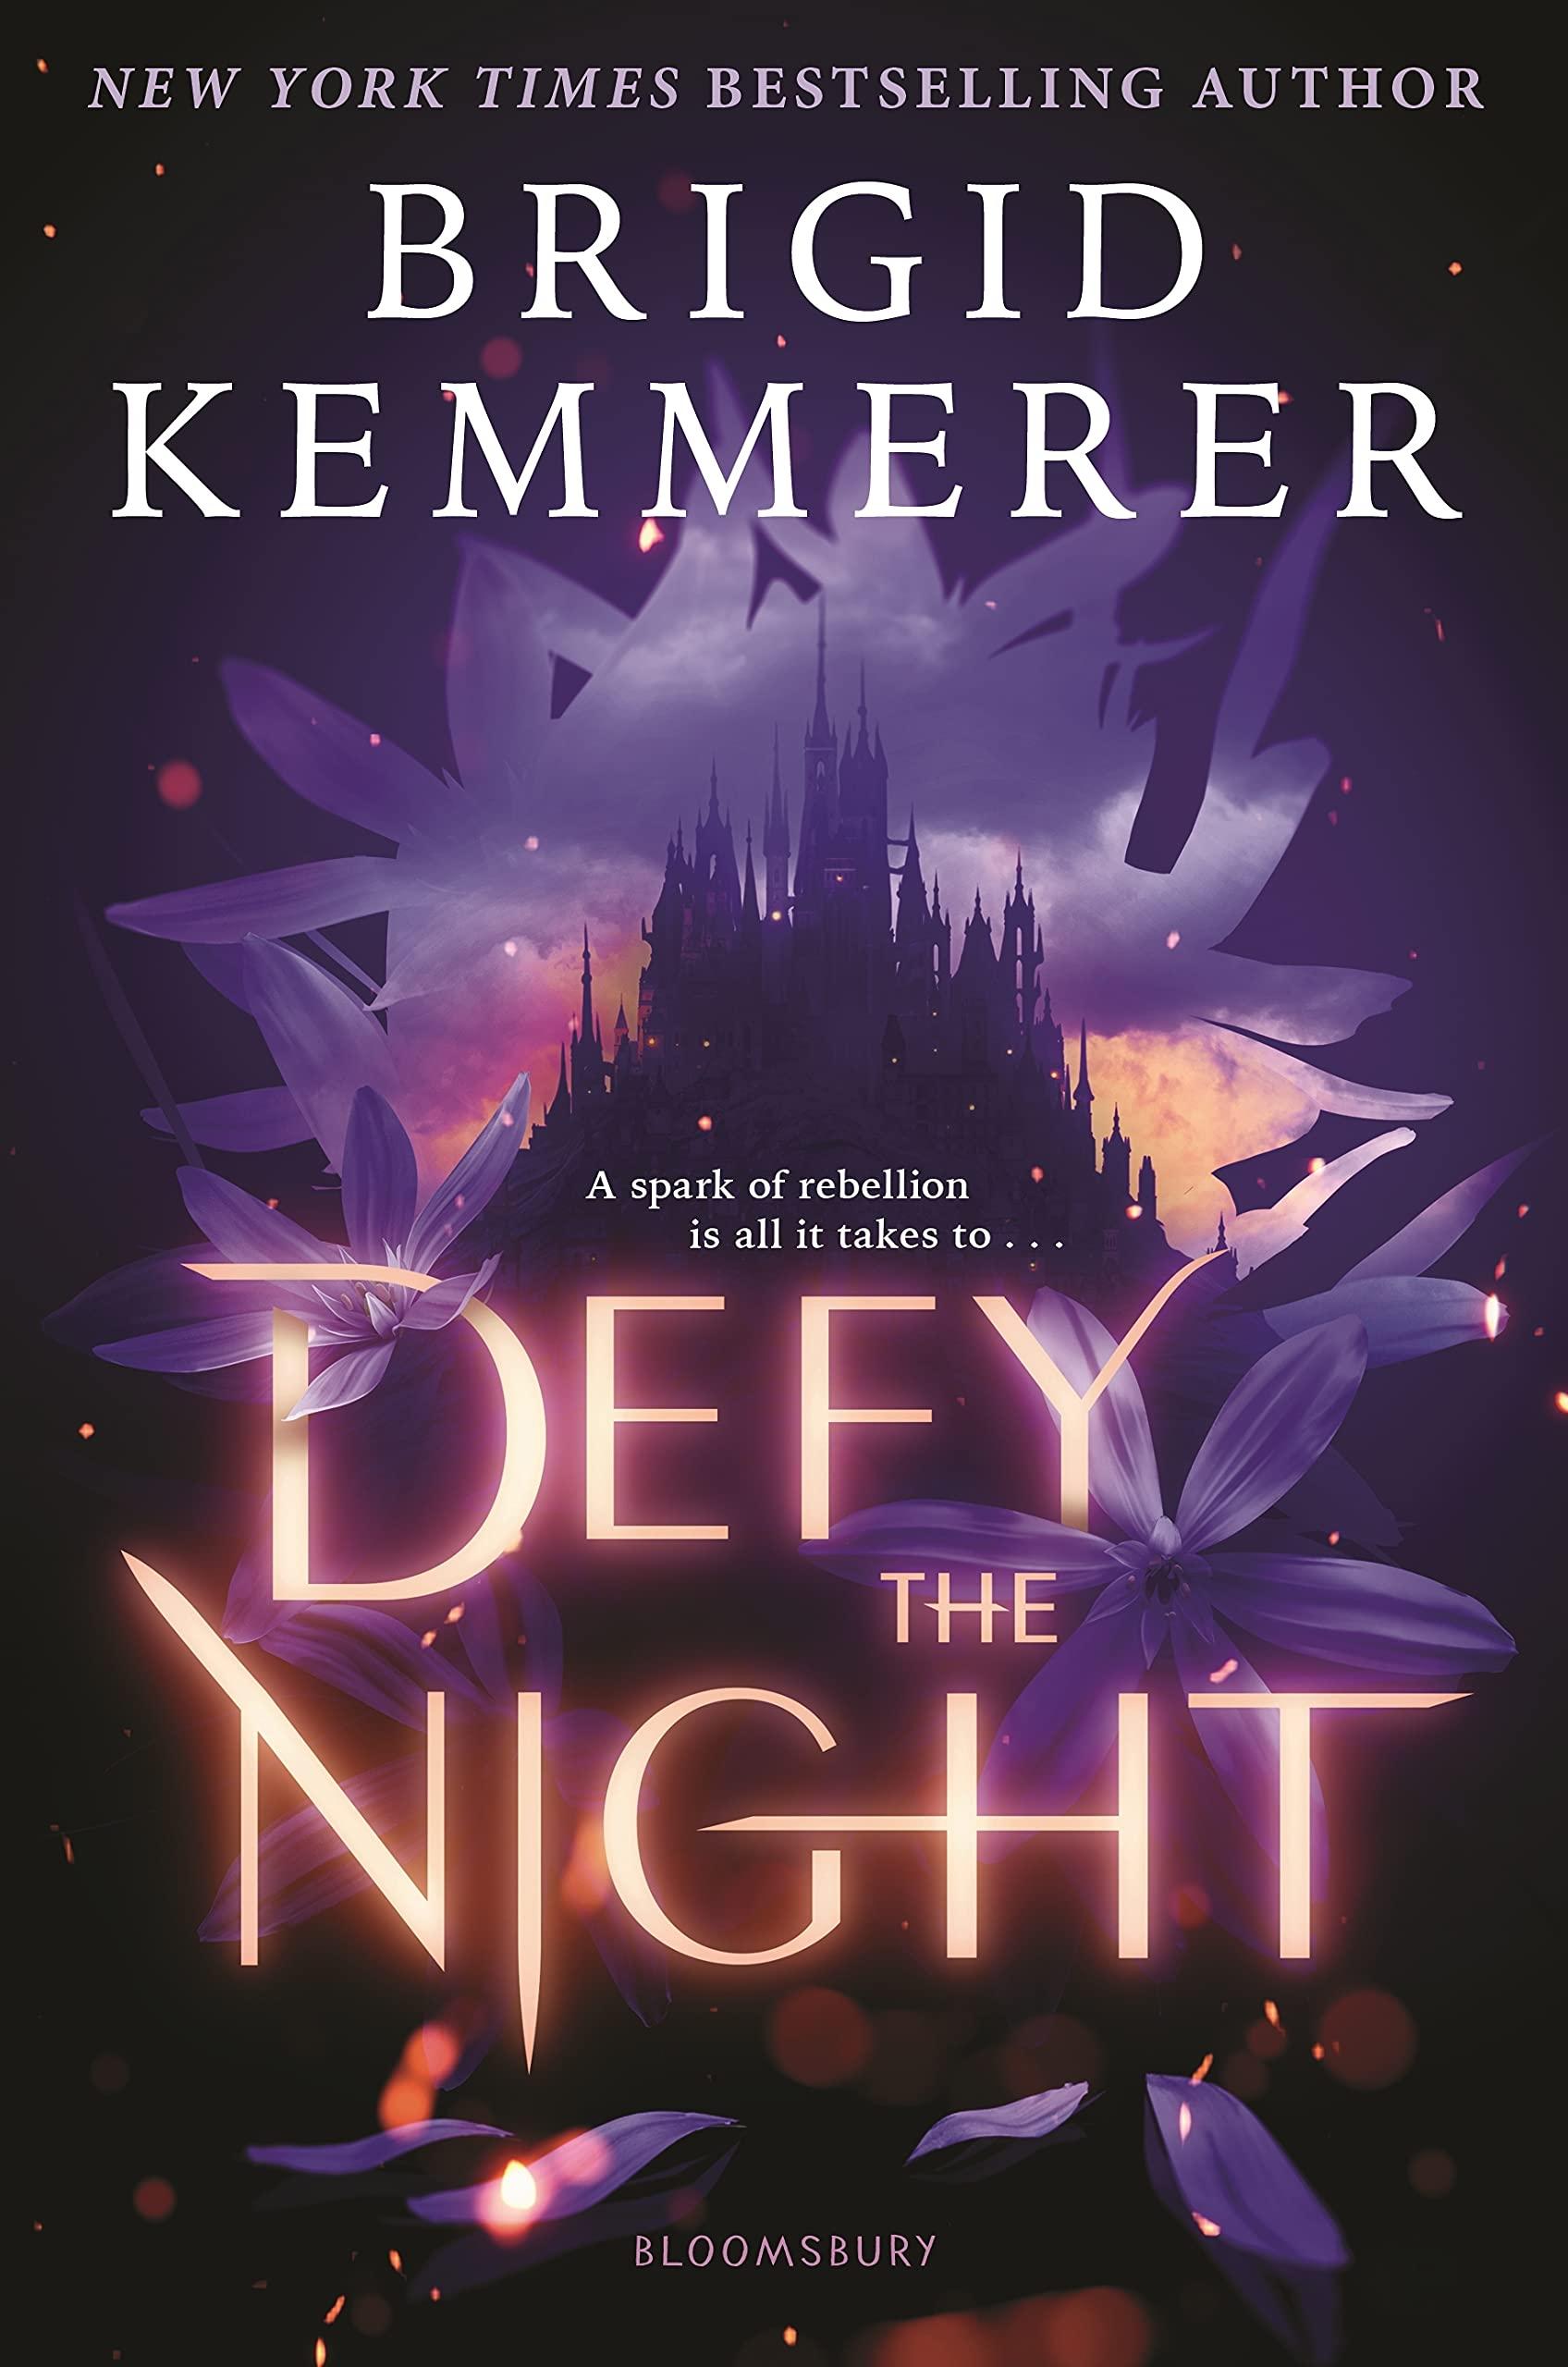 Amazon.com: Defy the Night (9781547604661): Kemmerer, Brigid: Books